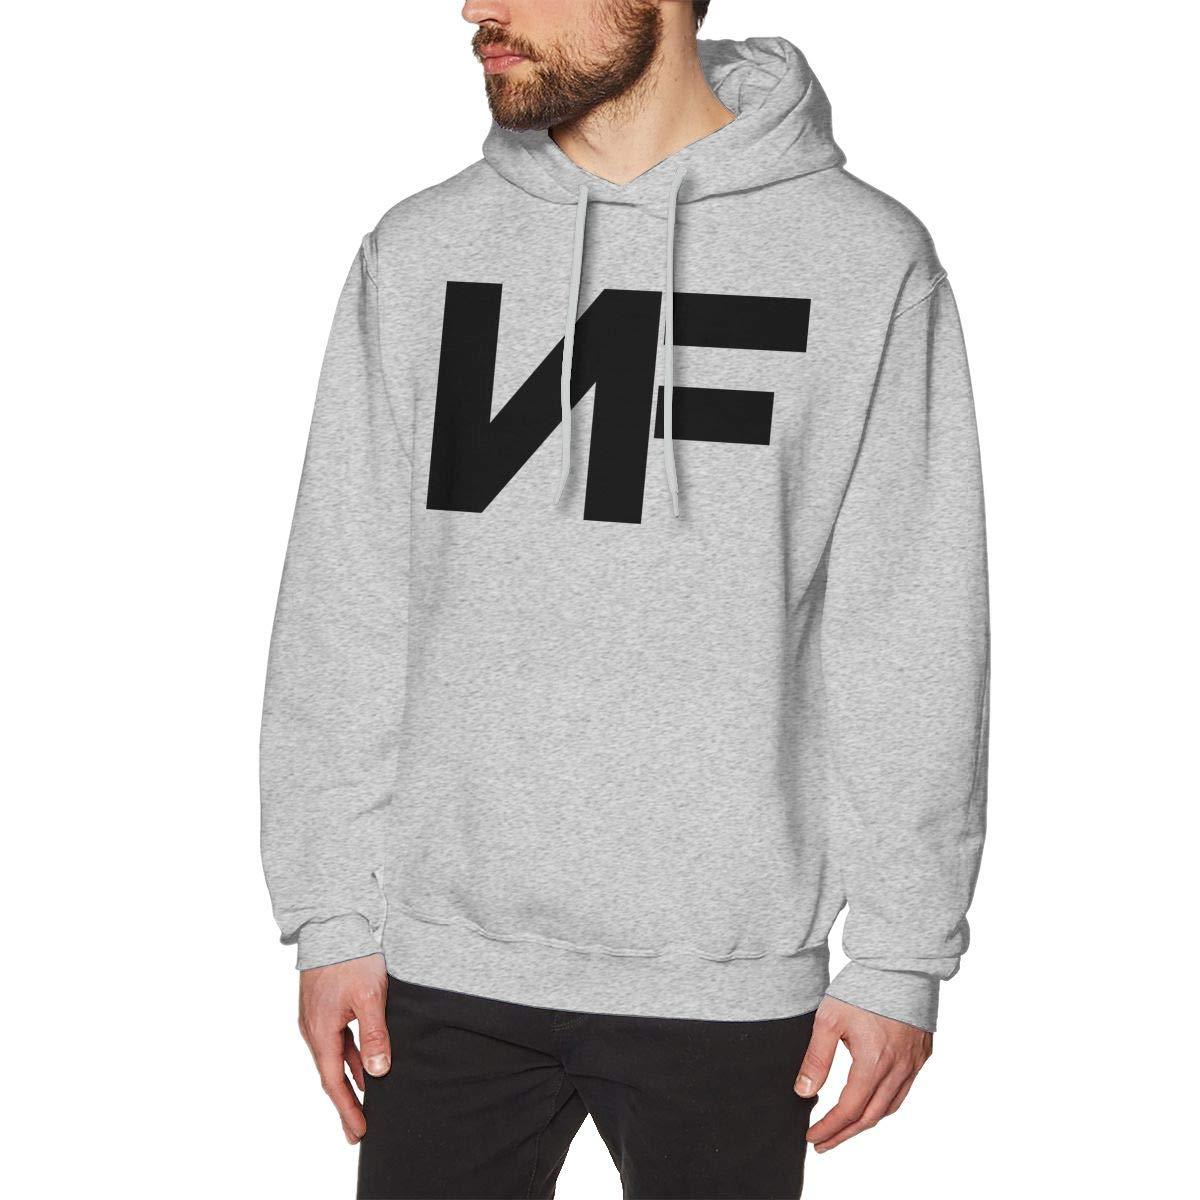 Men's NF Rapper Logo-Black Logo Hoodie Custom Pullover Sweatshirt Long Sleeve Hoodies Hooded for Youth Boys Men Gray S by Cxcai